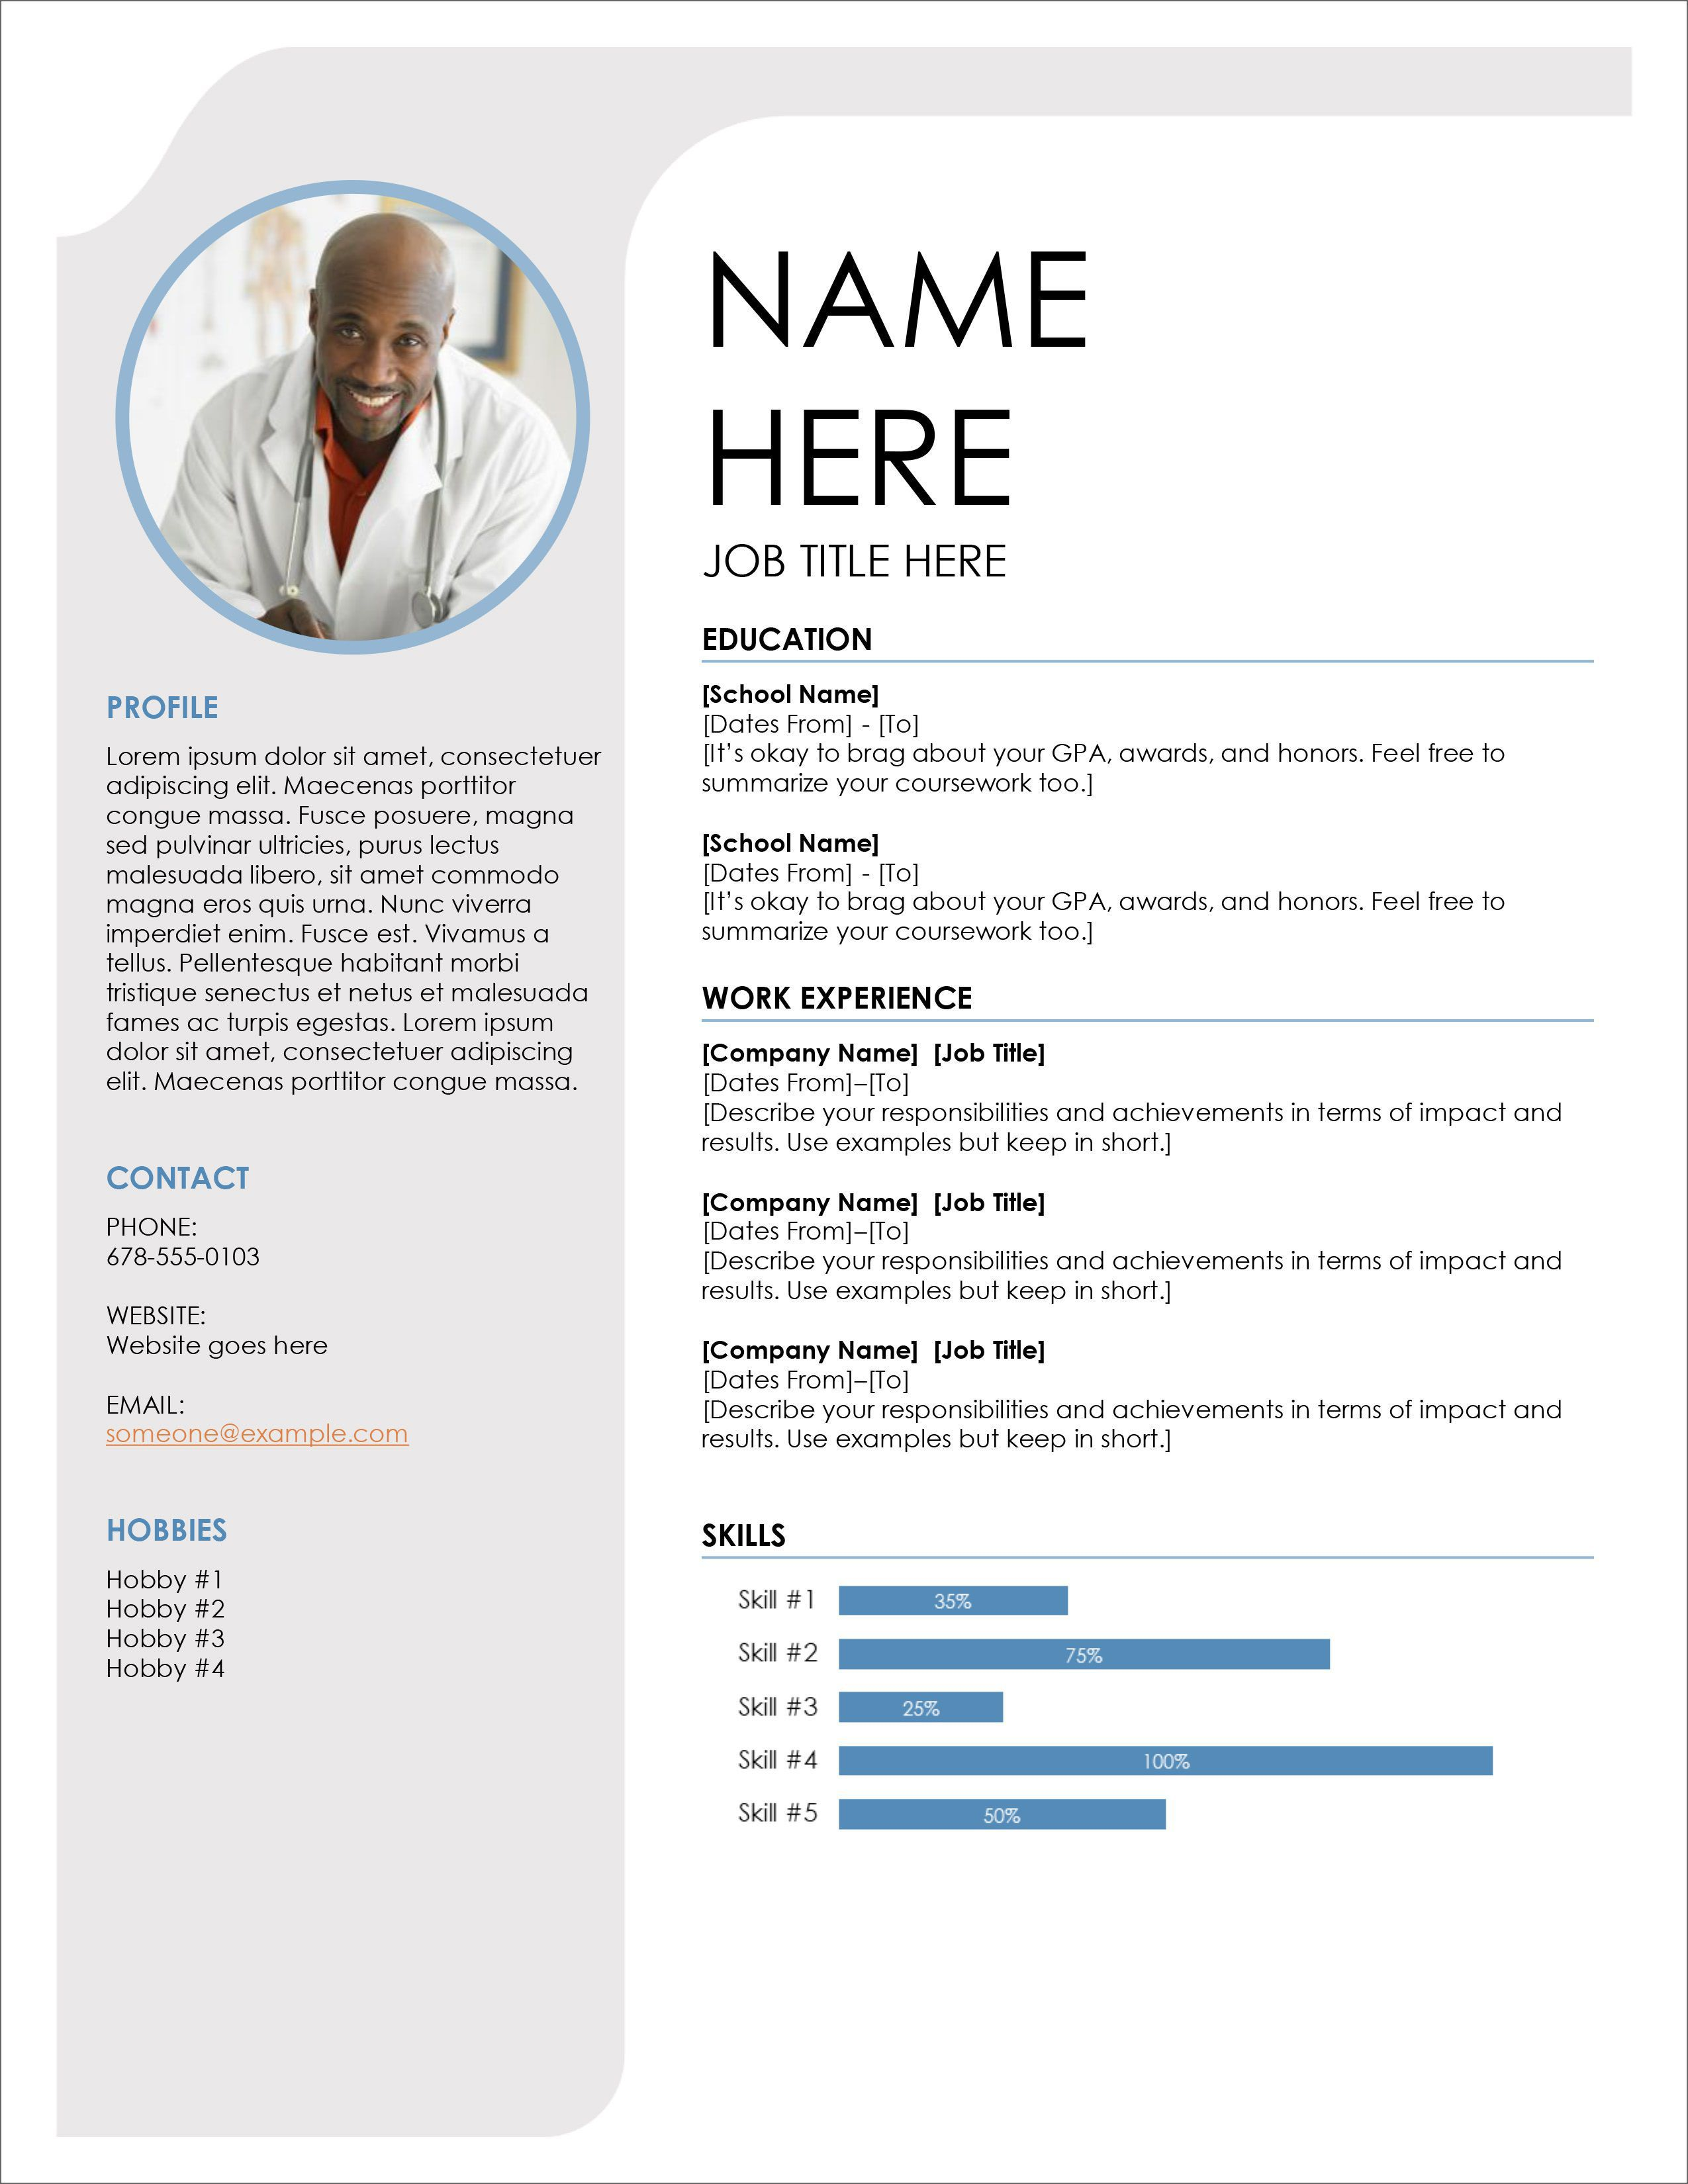 006 Awful Download Resume Sample Free High Resolution  Teacher Cv Graphic Designer Word Format Nurse TemplateFull